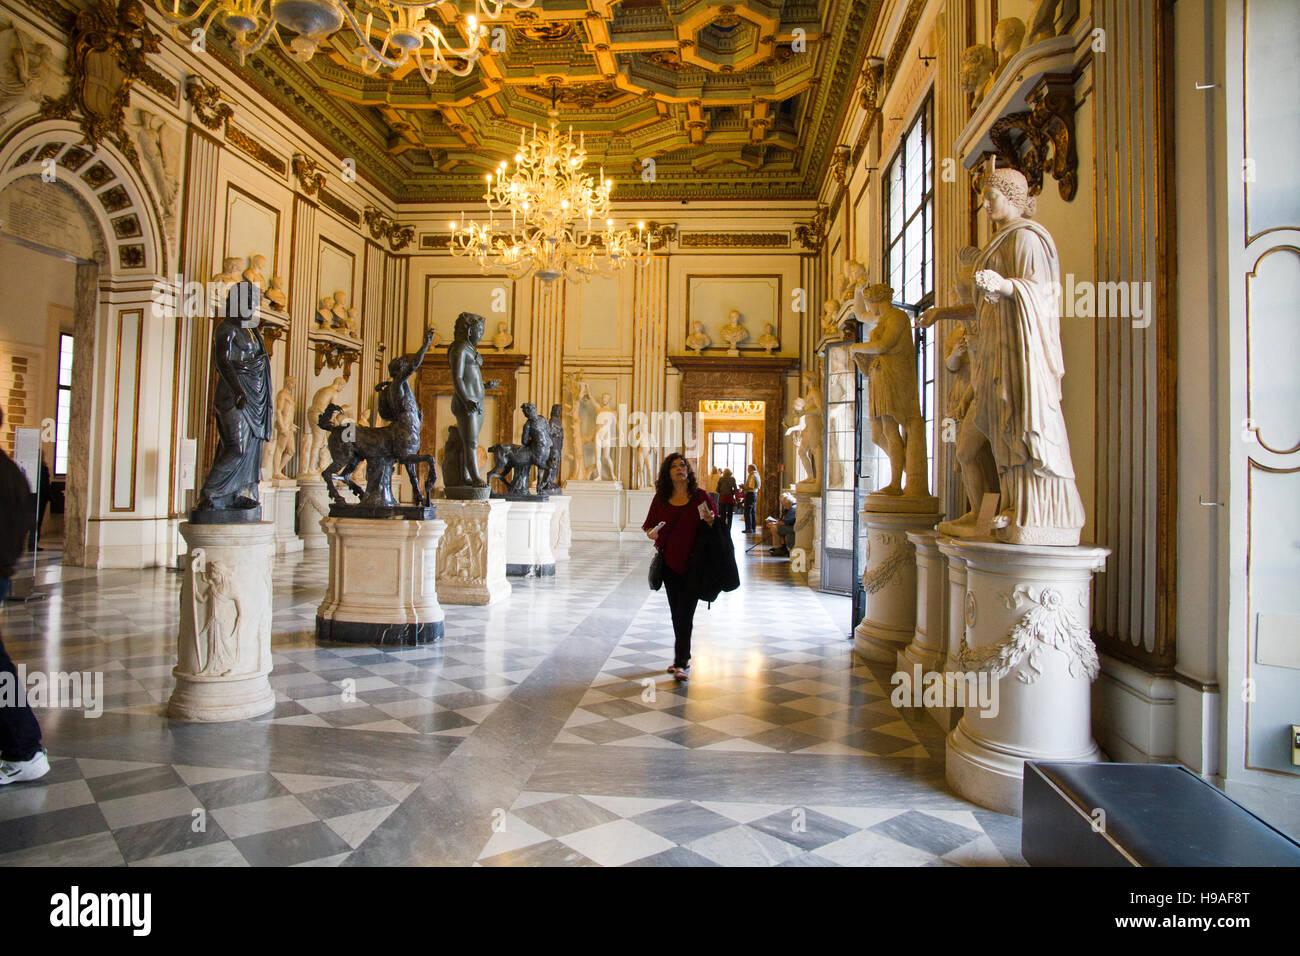 Capitoline museums hall , Rome, italy,  musei capitolini, art heritage touristic landmark - Stock Image